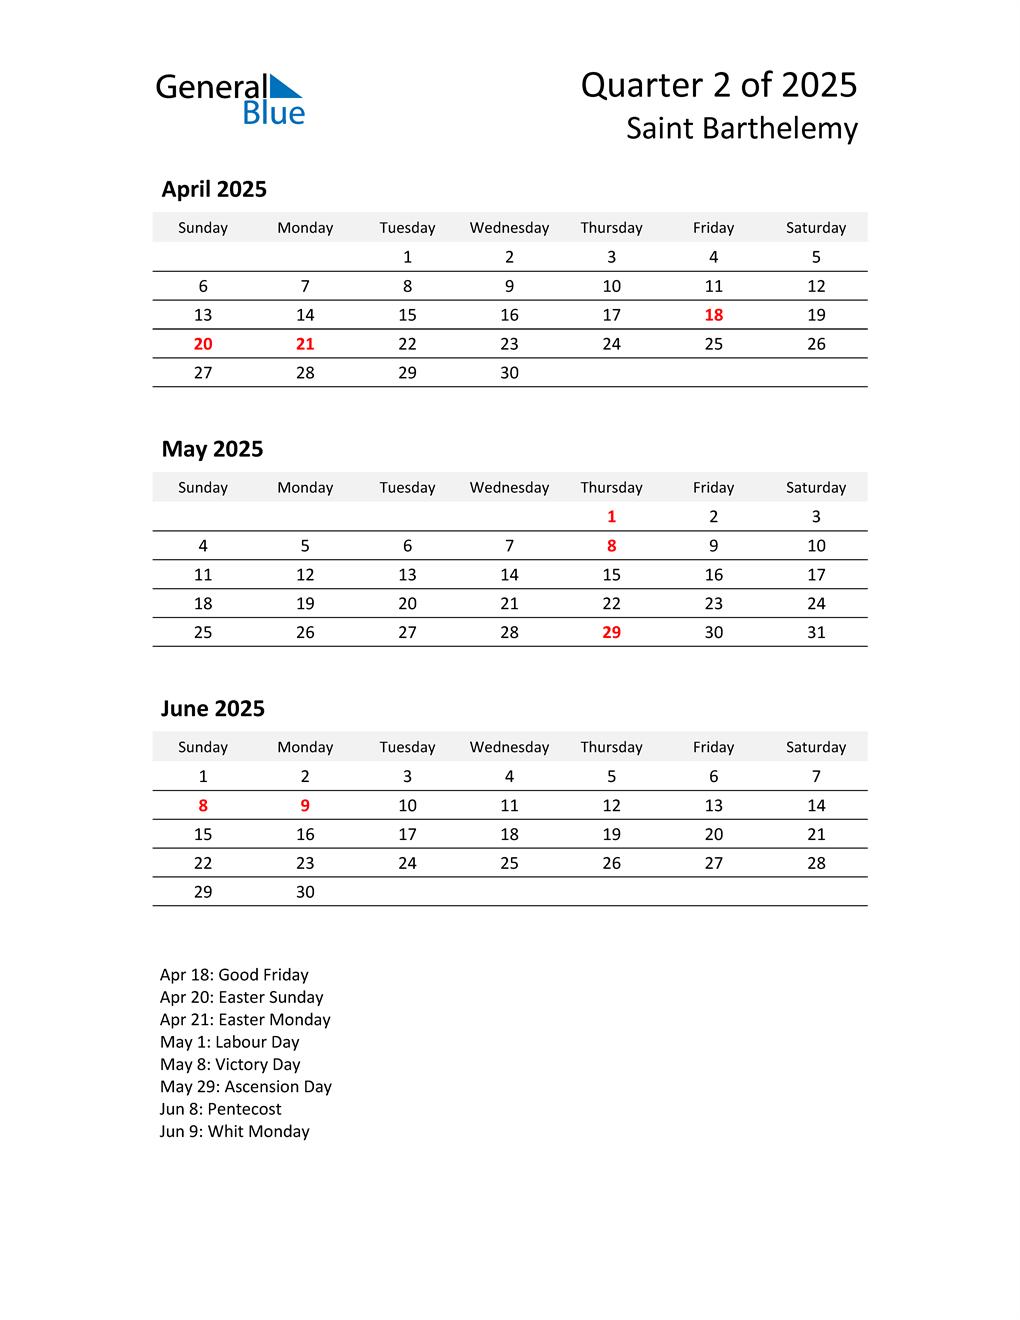 2025 Three-Month Calendar for Saint Barthelemy